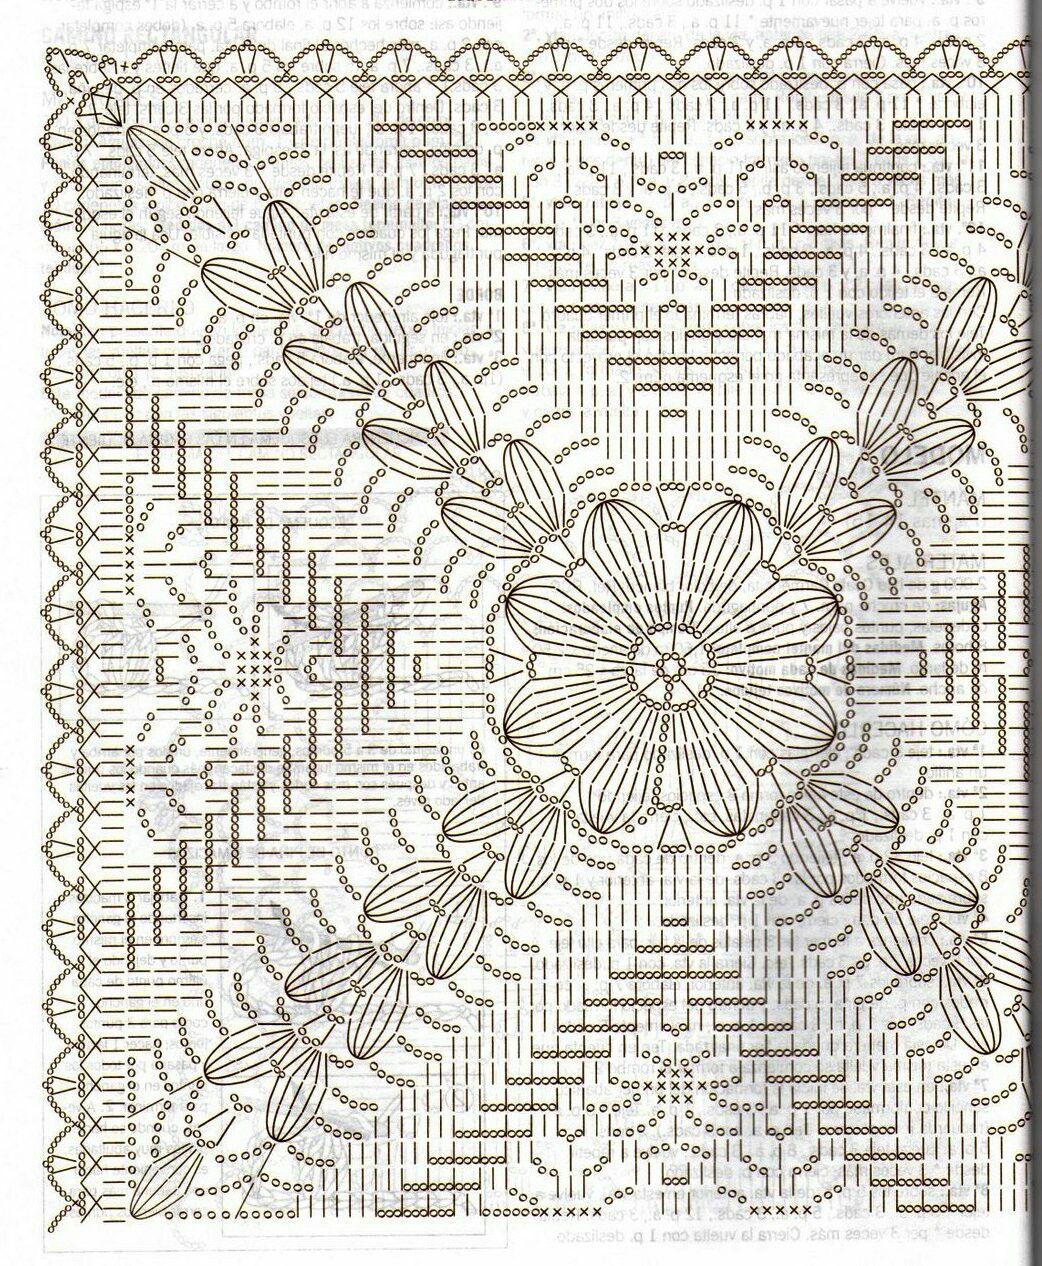 Crochet square | Granny square bobble charts | Pinterest ...